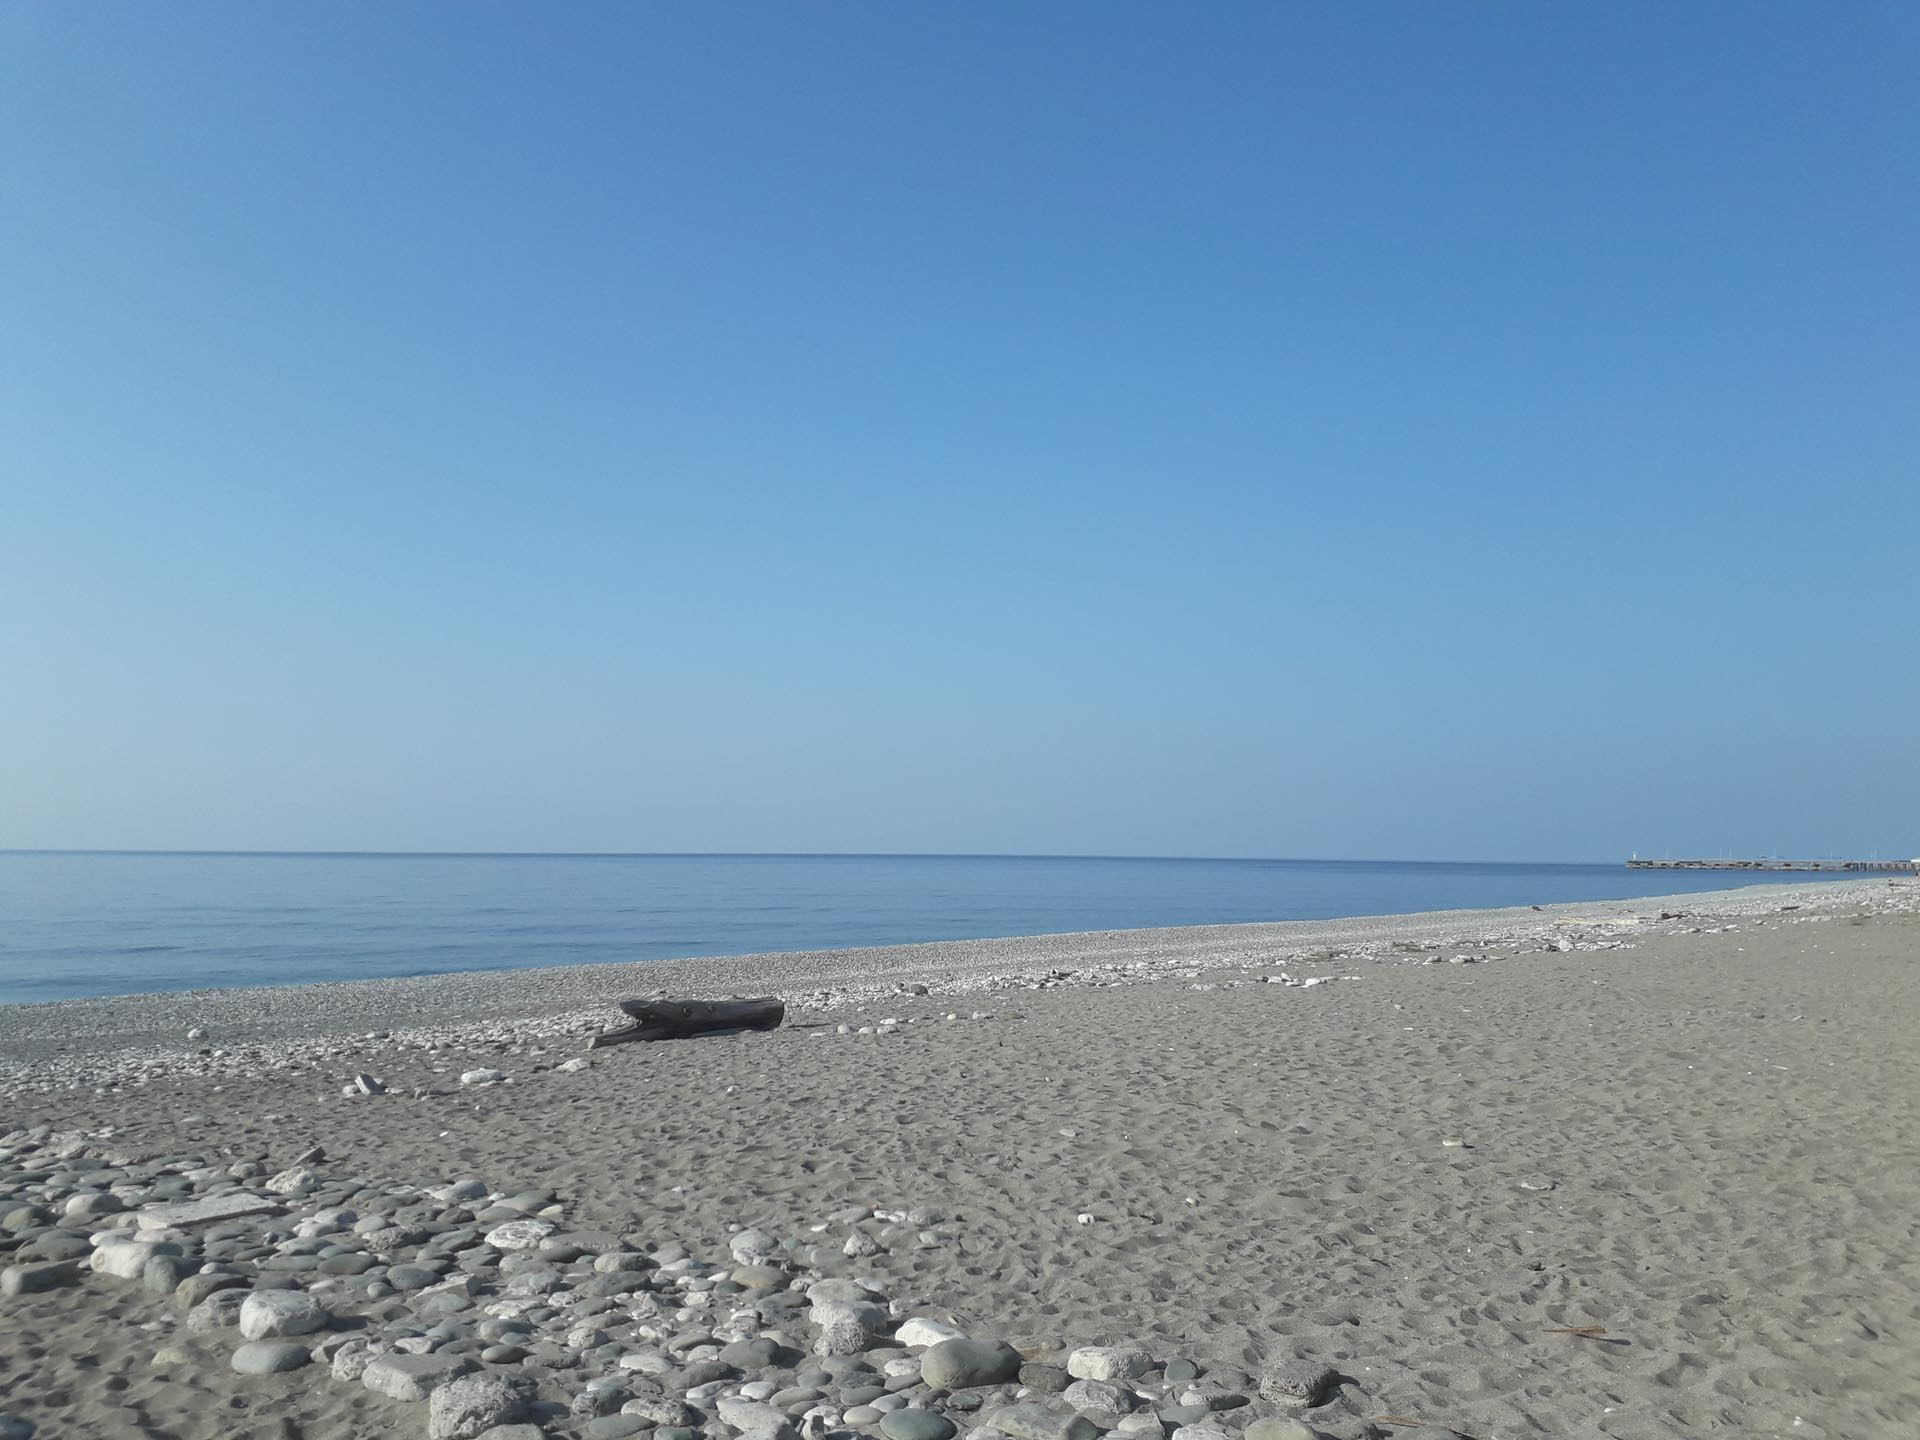 Берег Моря в Абхазии